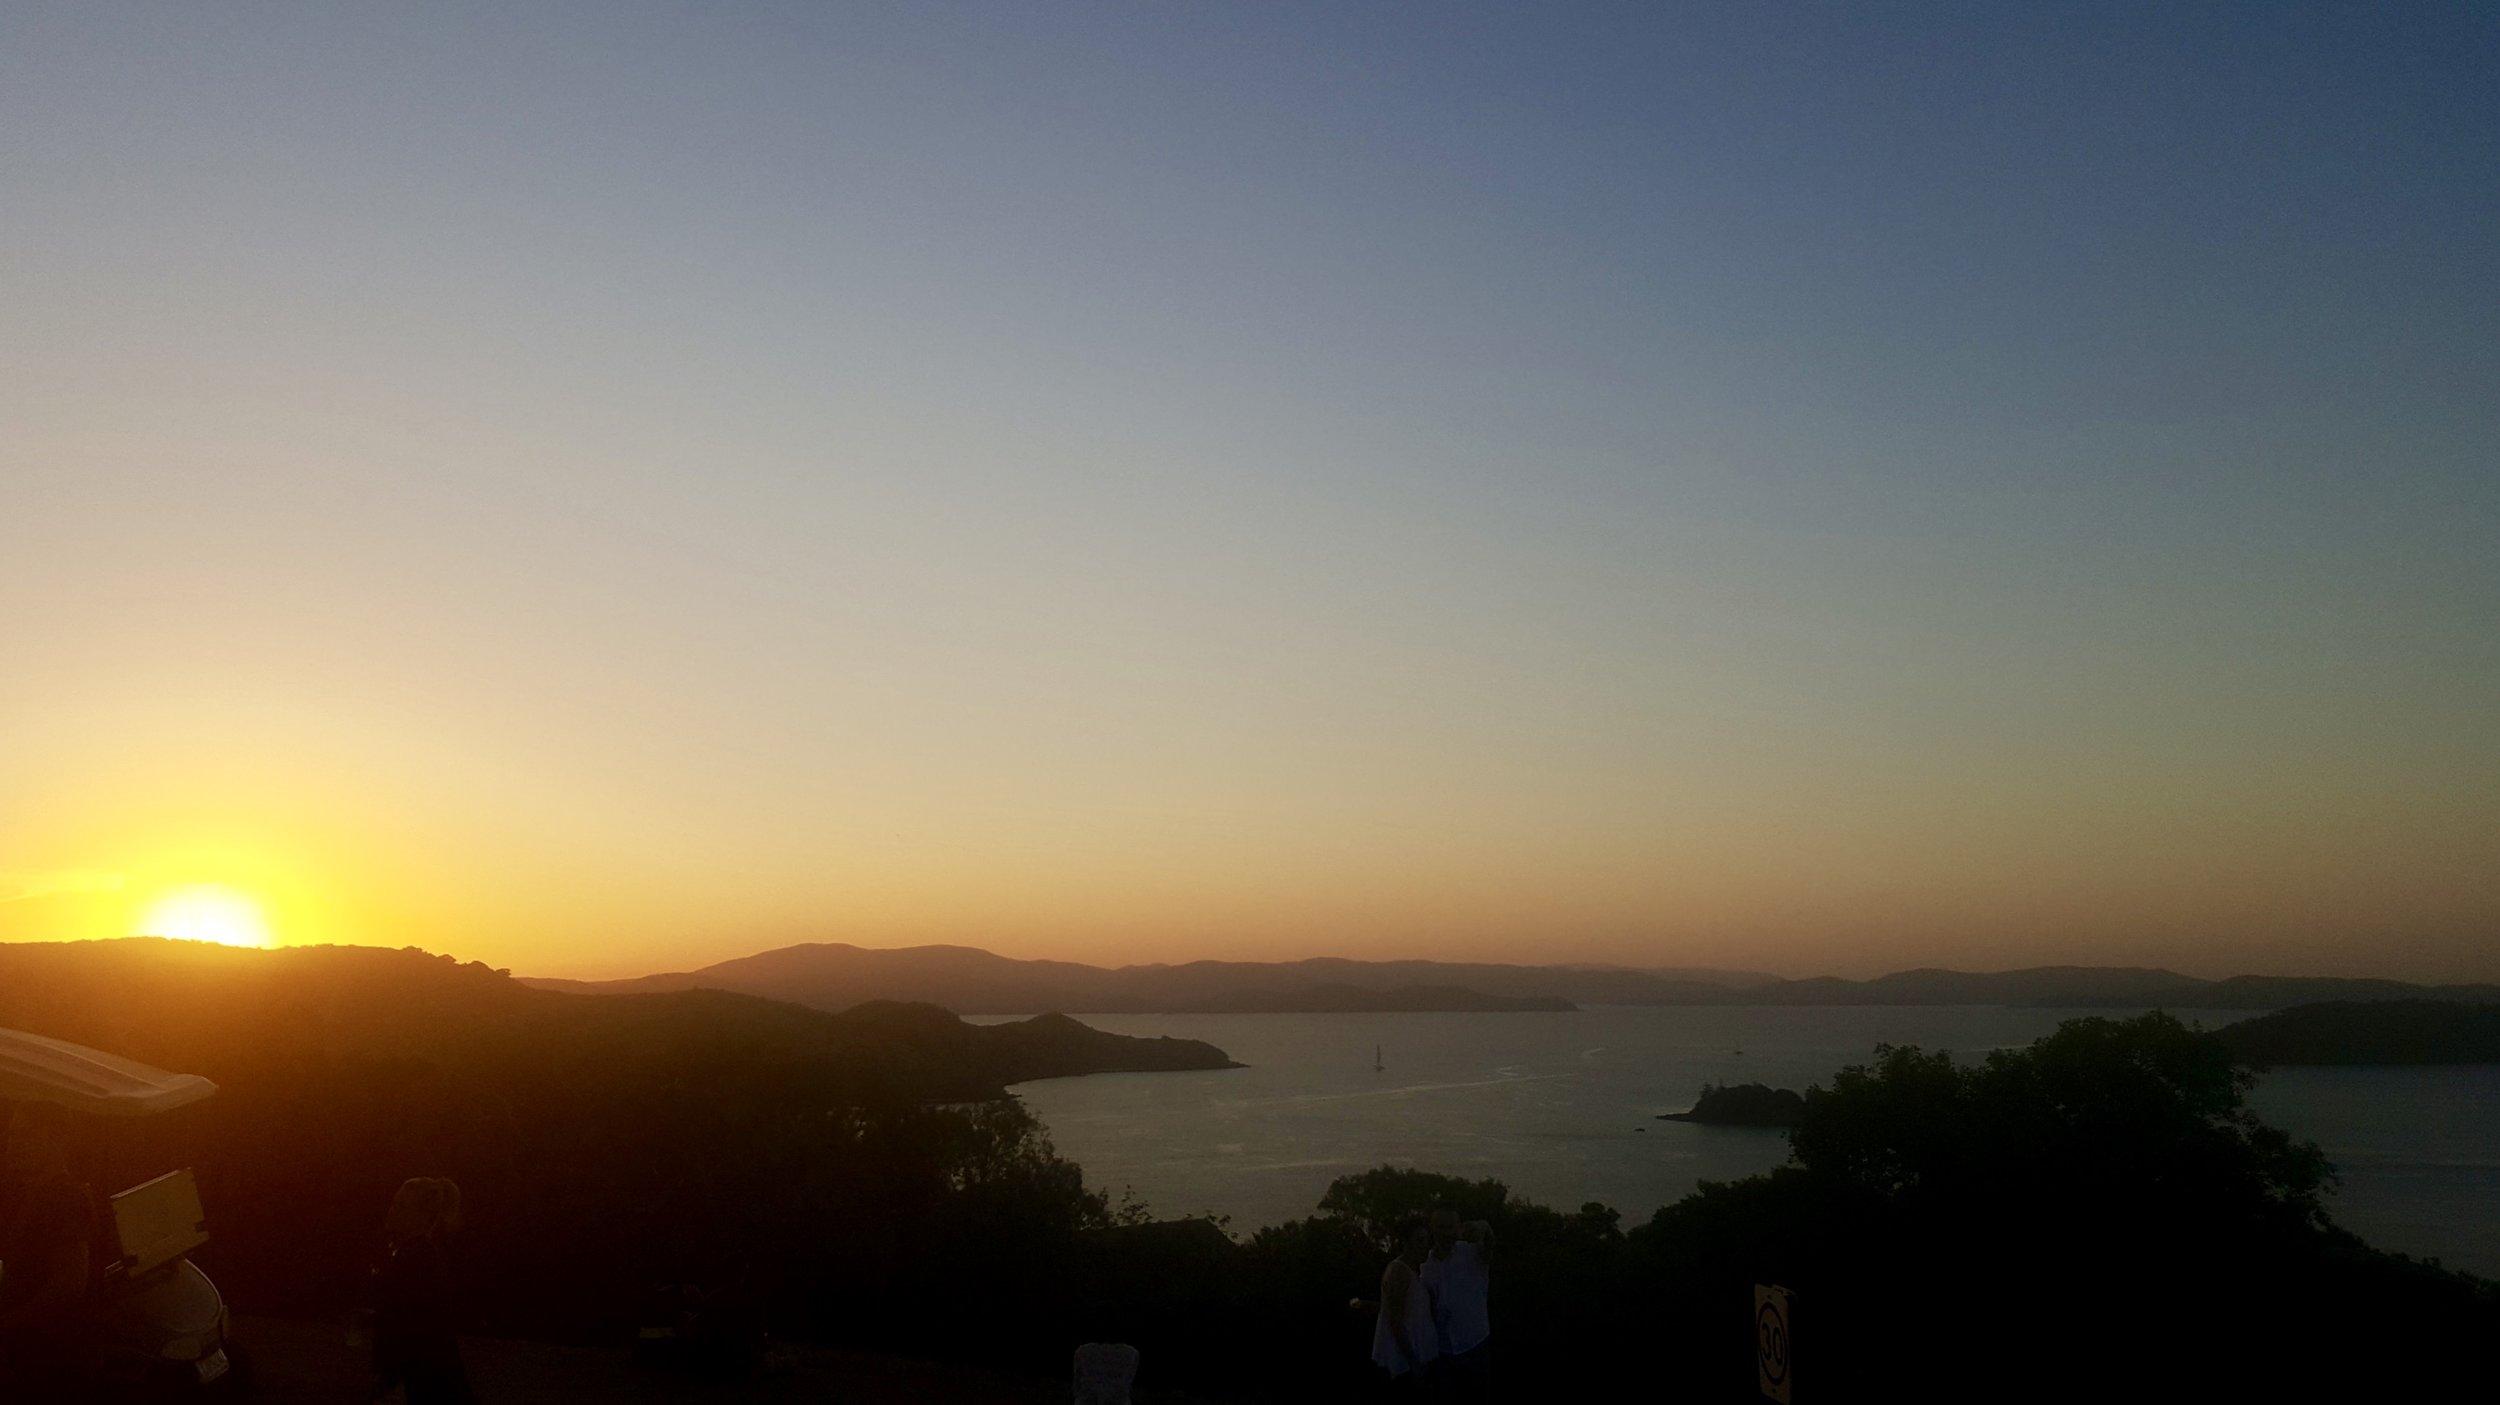 Sunset at One Tree Hill, Hamilton Island, Whitsundays, Queensland, Australia